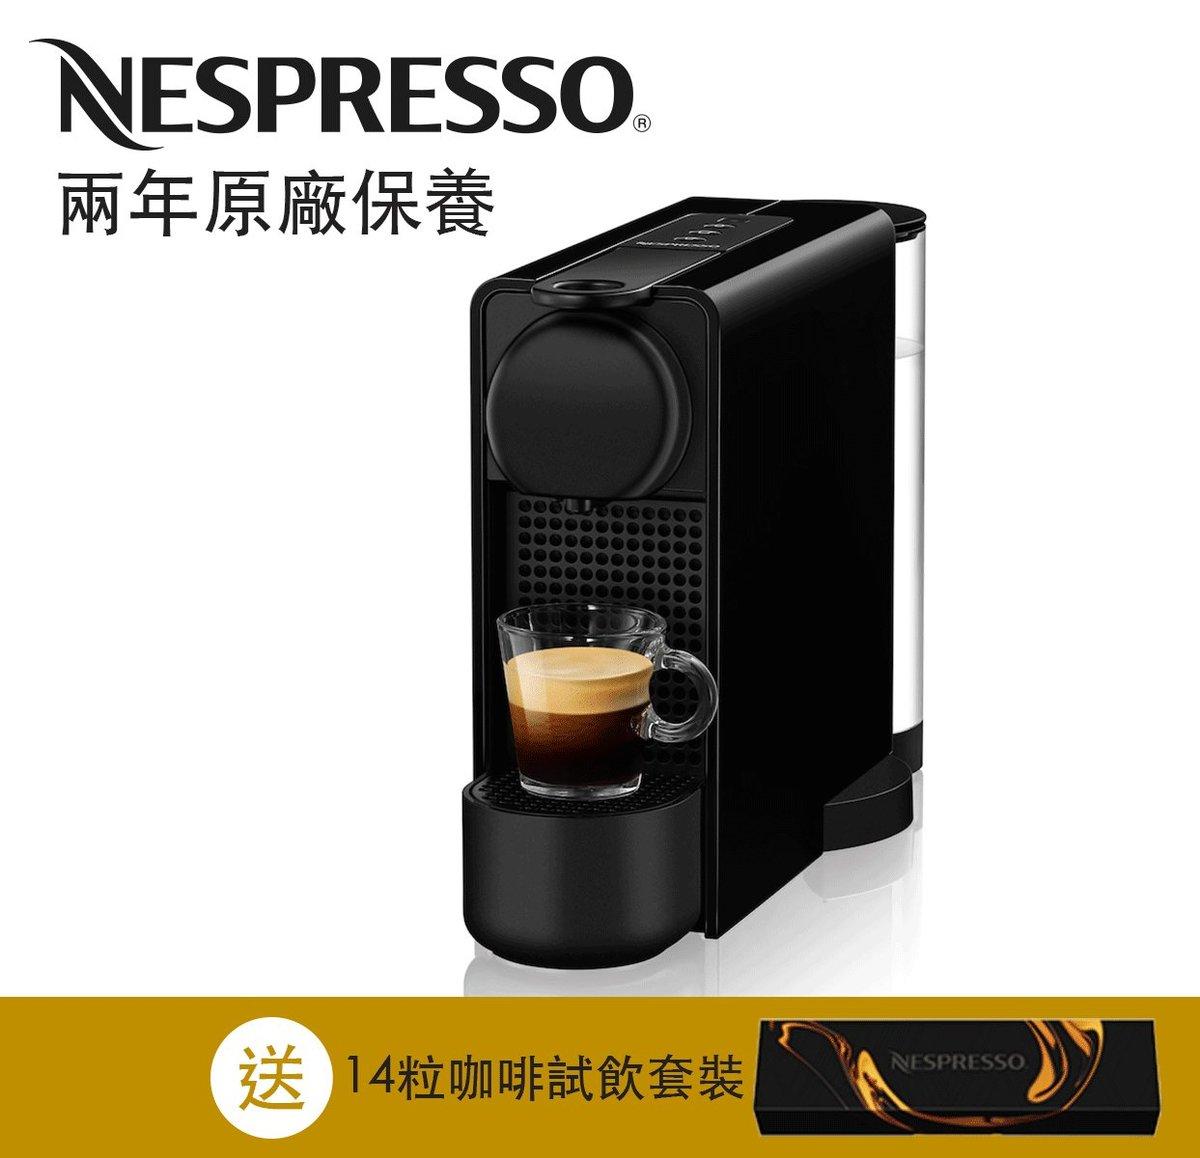 C45 Essenza Plus Coffee Machine, Limousine Black